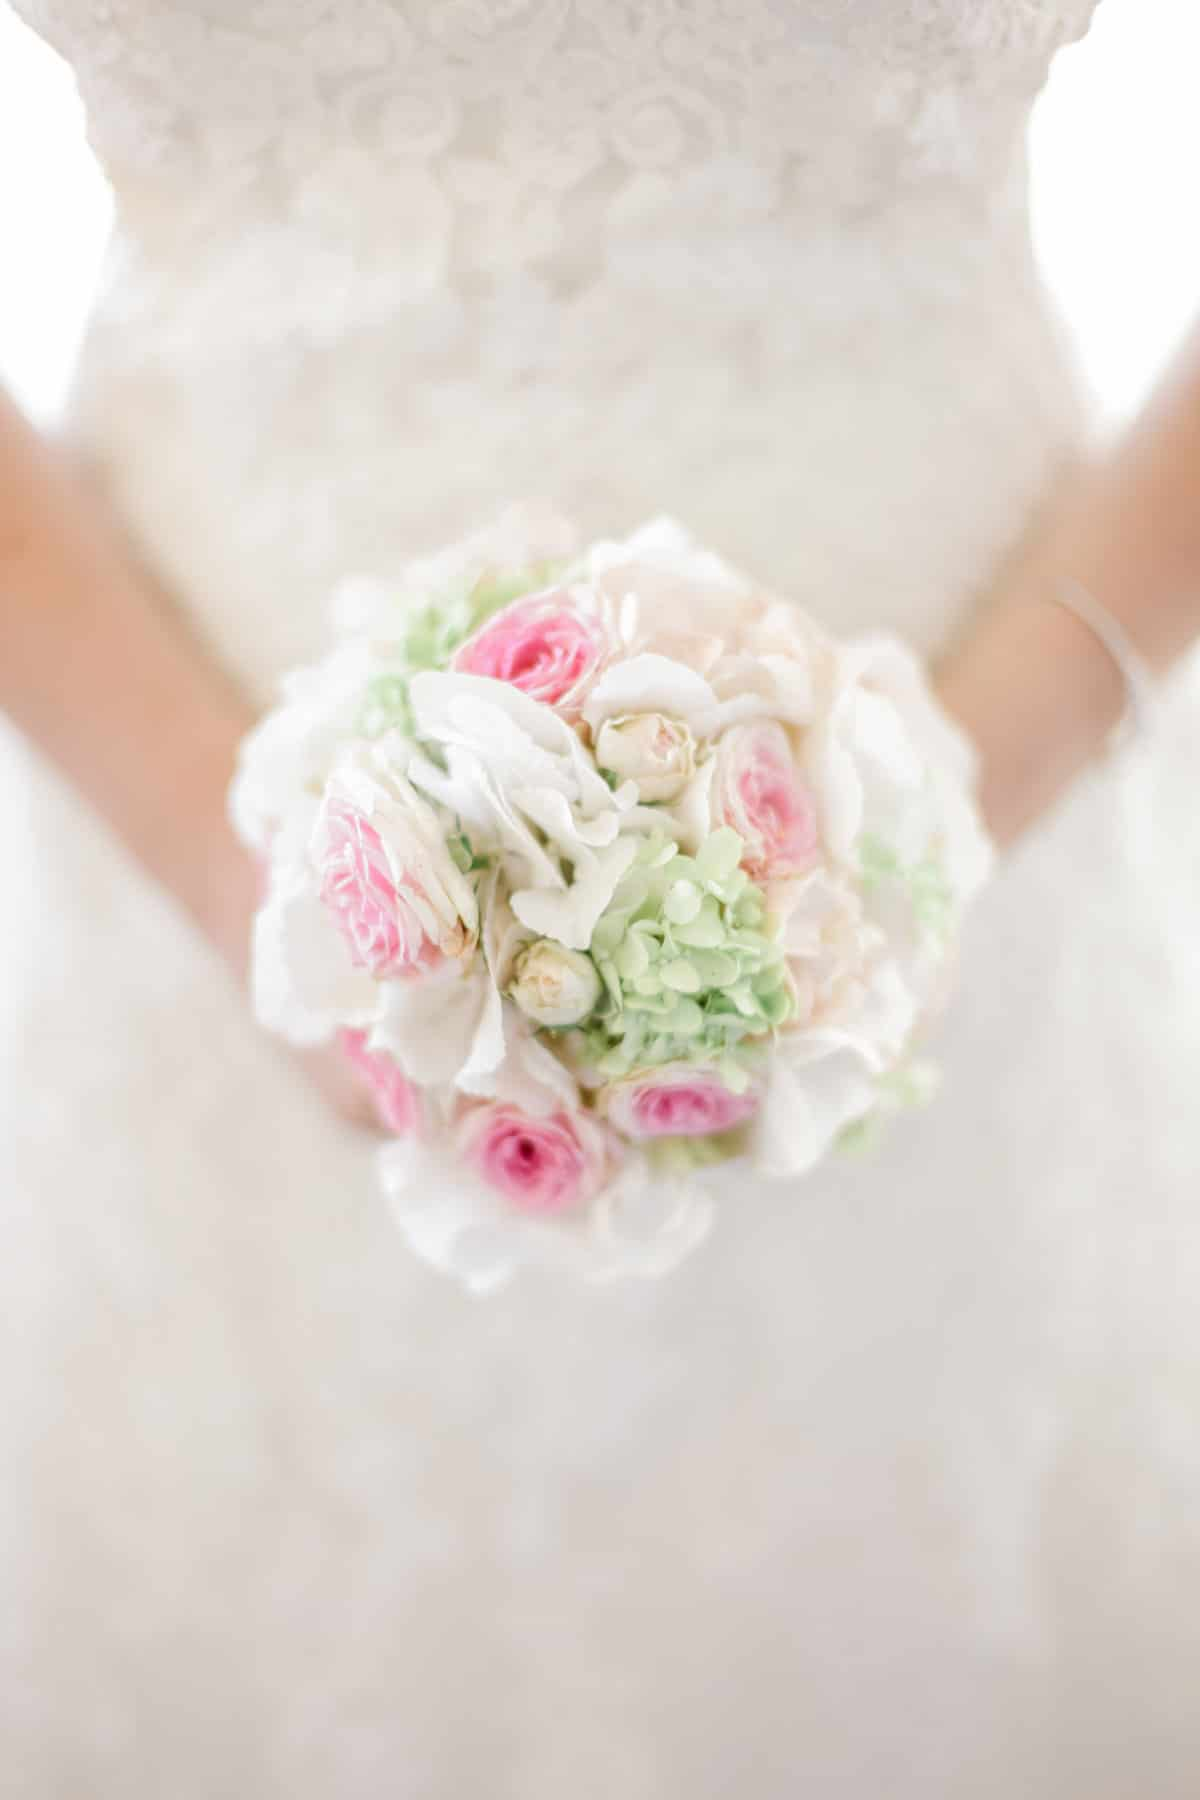 photographe mariage bordeaux landes fineart francais sarah miramon blog 08